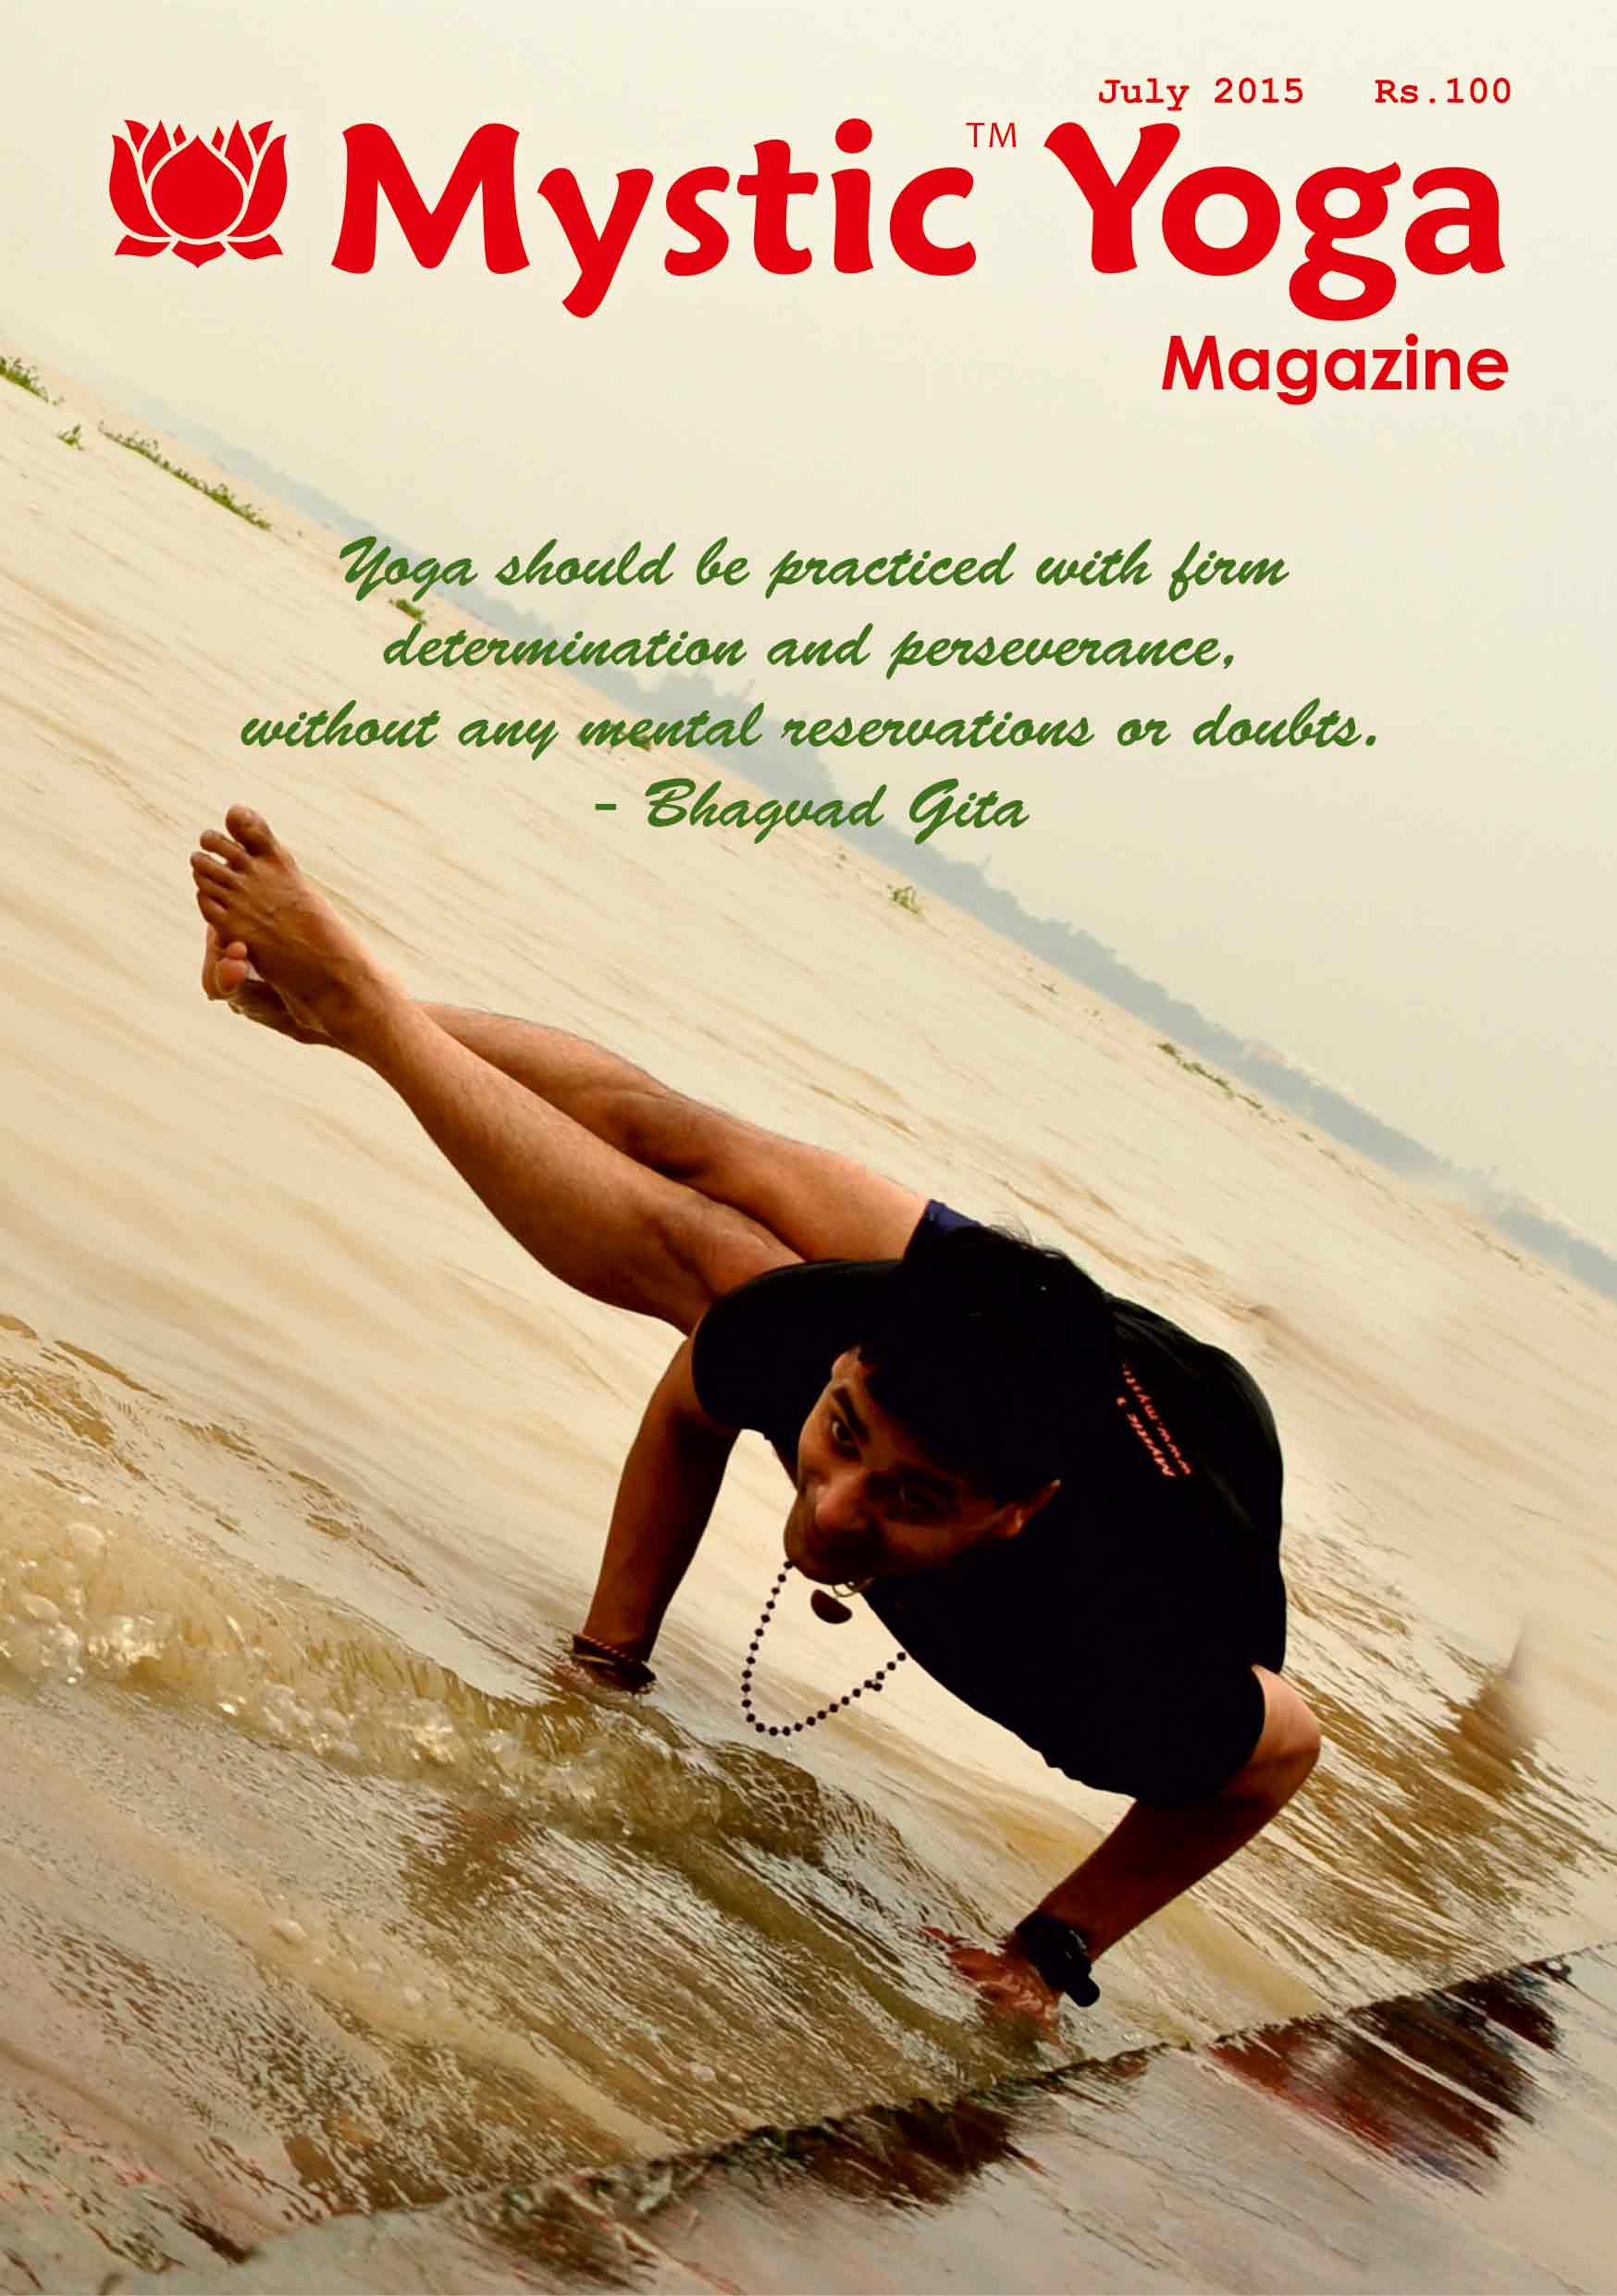 Mystic Yoga Magazine - July 2015